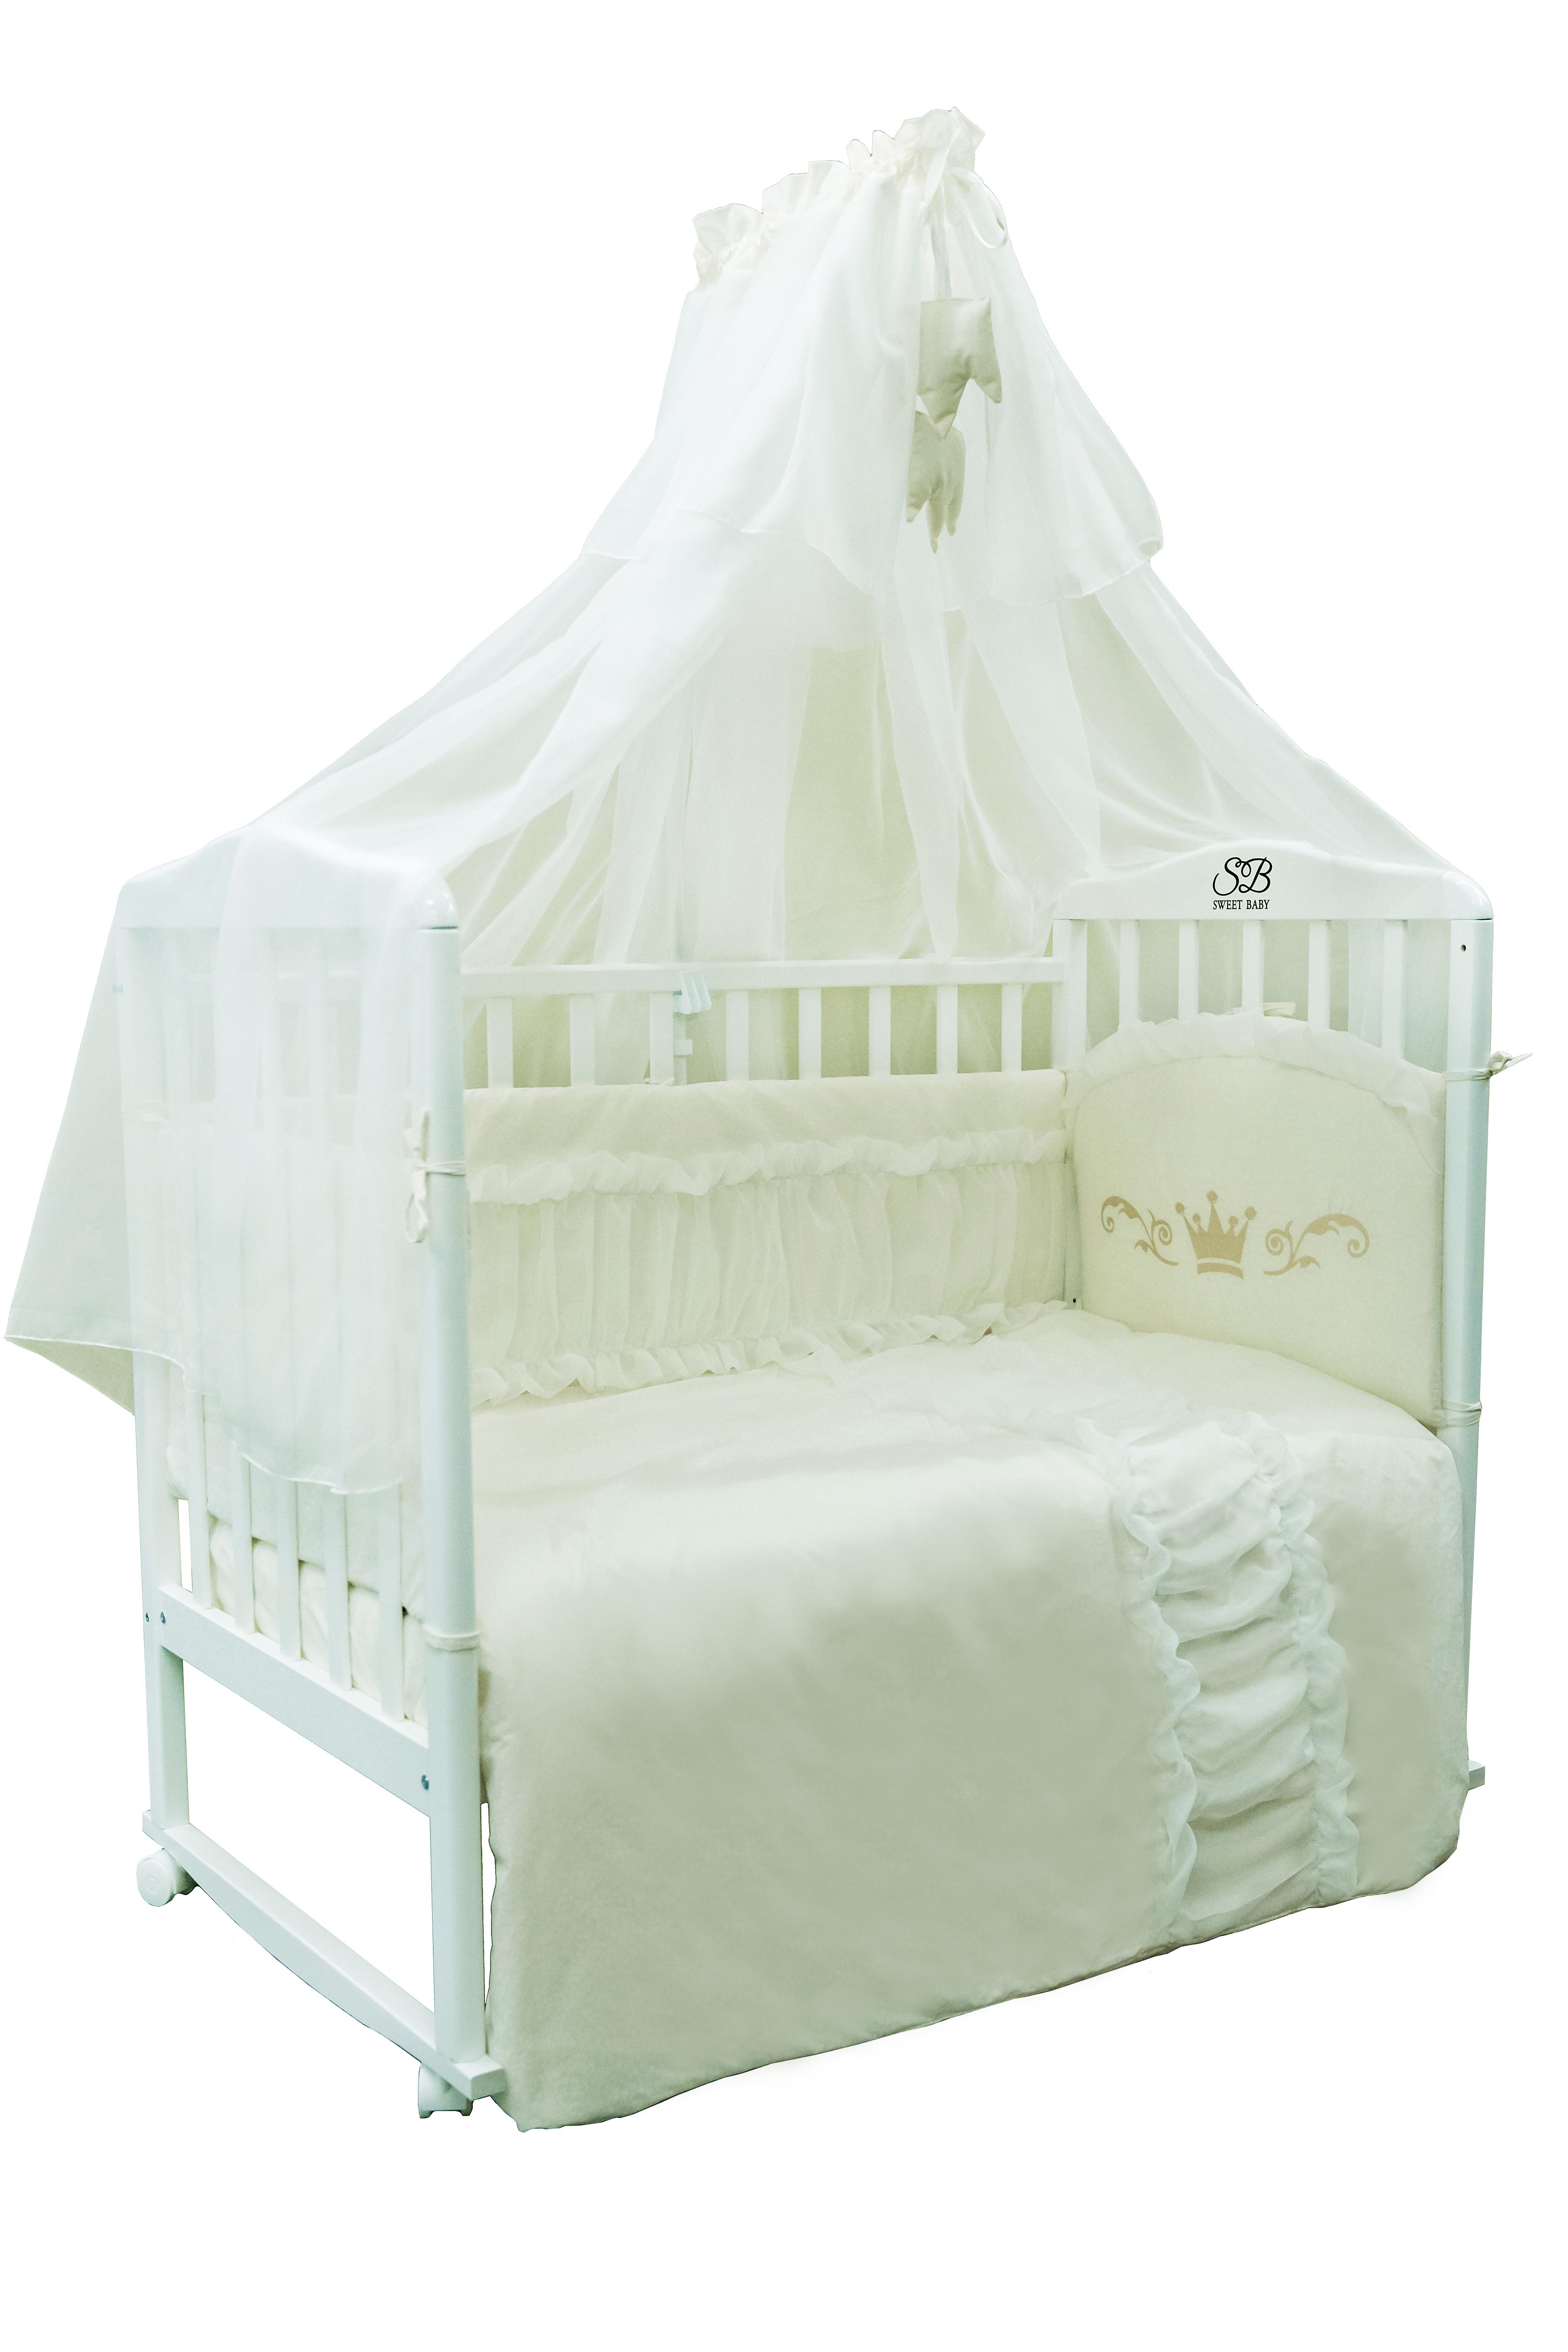 Постельные принадлежности Sweet Baby Комплект в кроватку Sweet Baby «Corona Beige» 7 пр. кремовый комплект в кроватку sweet baby vela beige бежевый с рис 7 предметов сатин